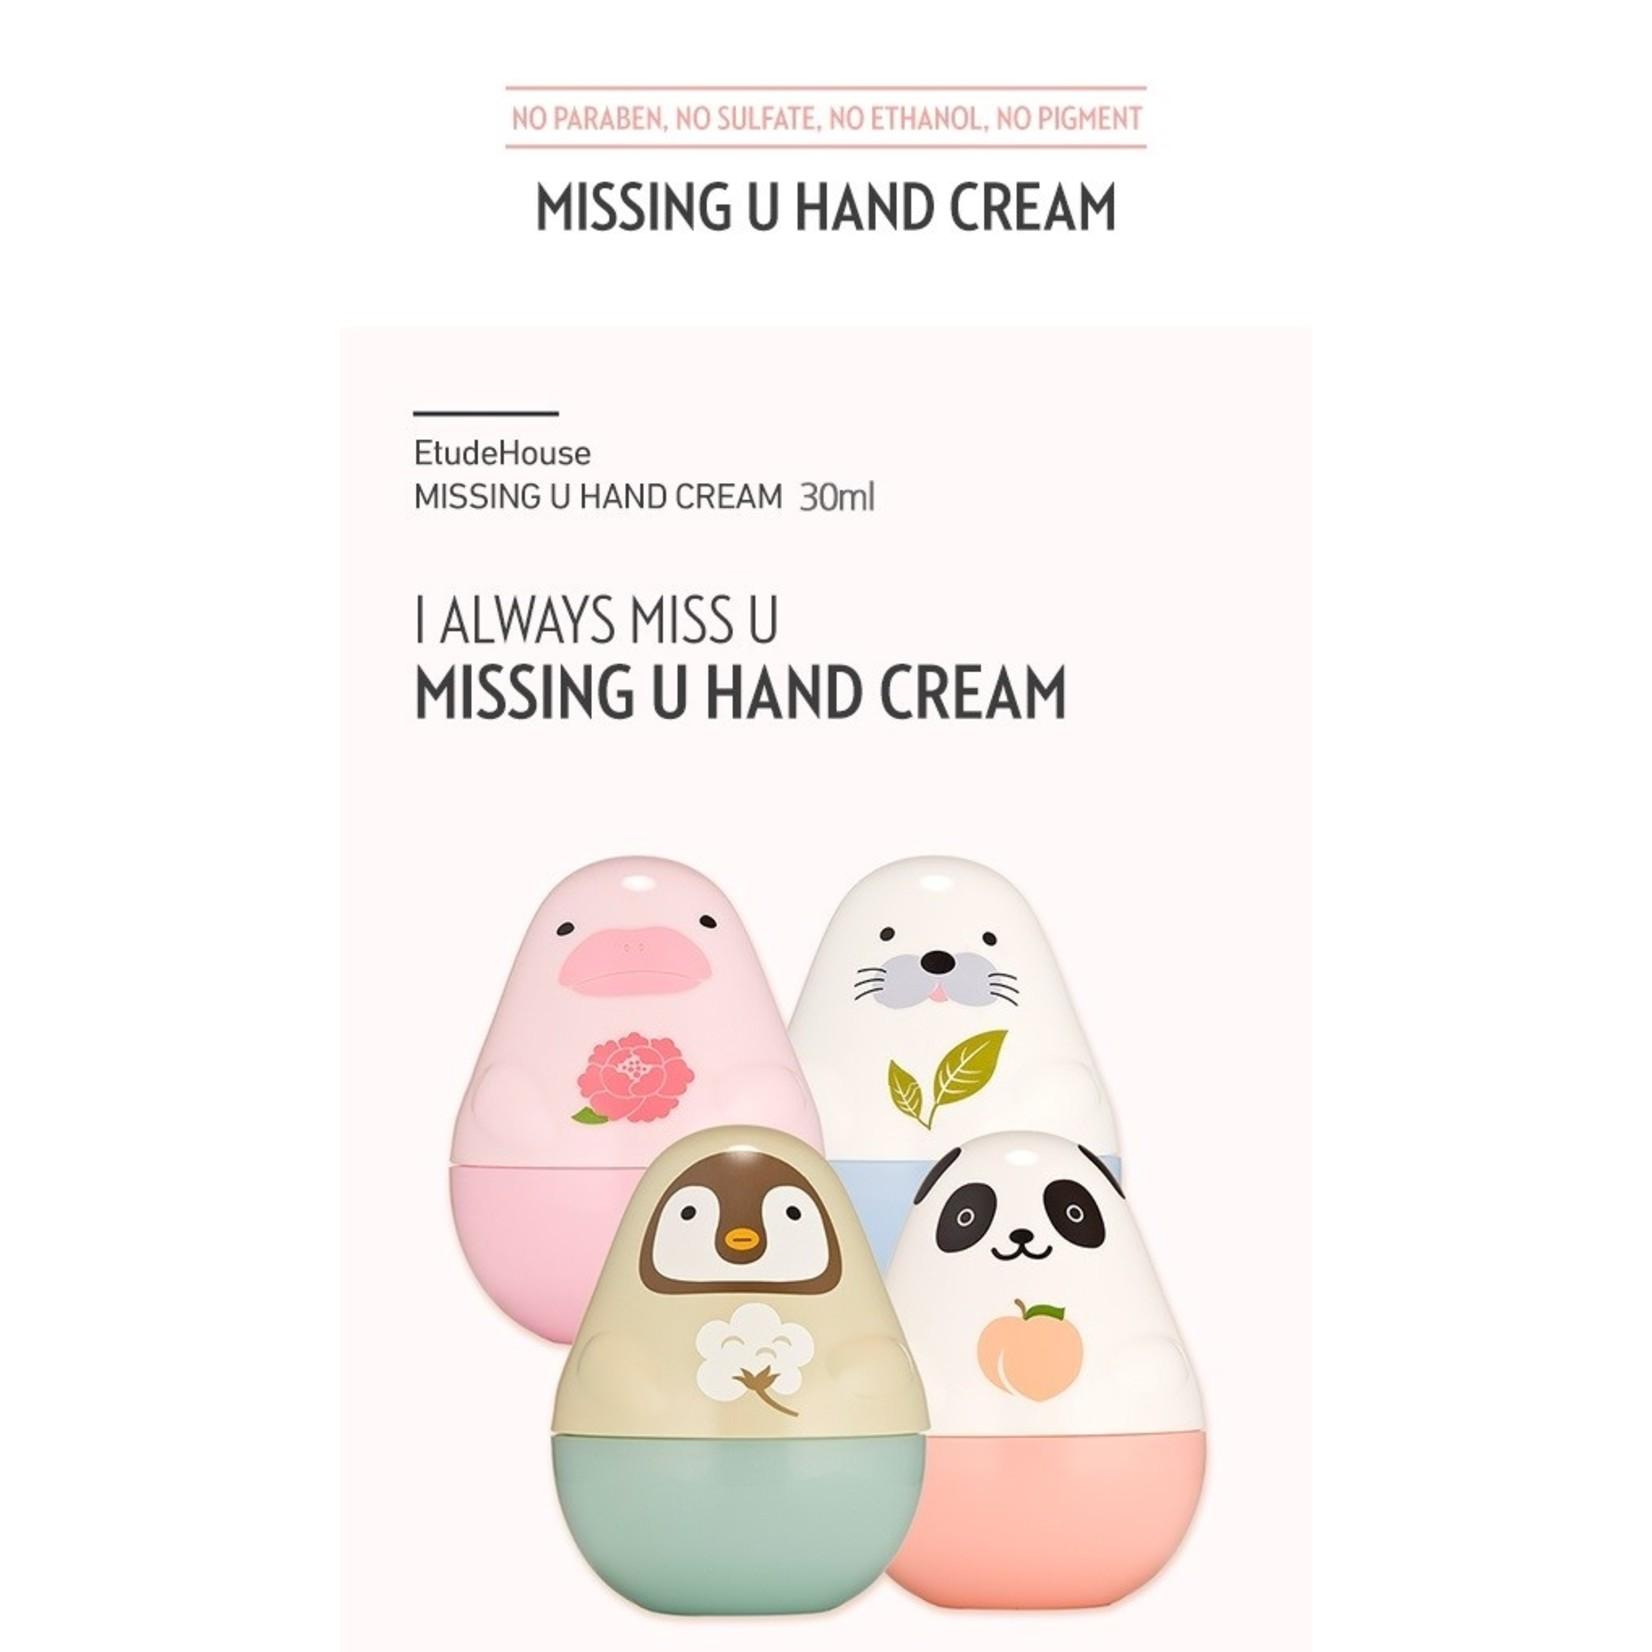 Etude House Missing U Hand Cream #1 Harp Seals